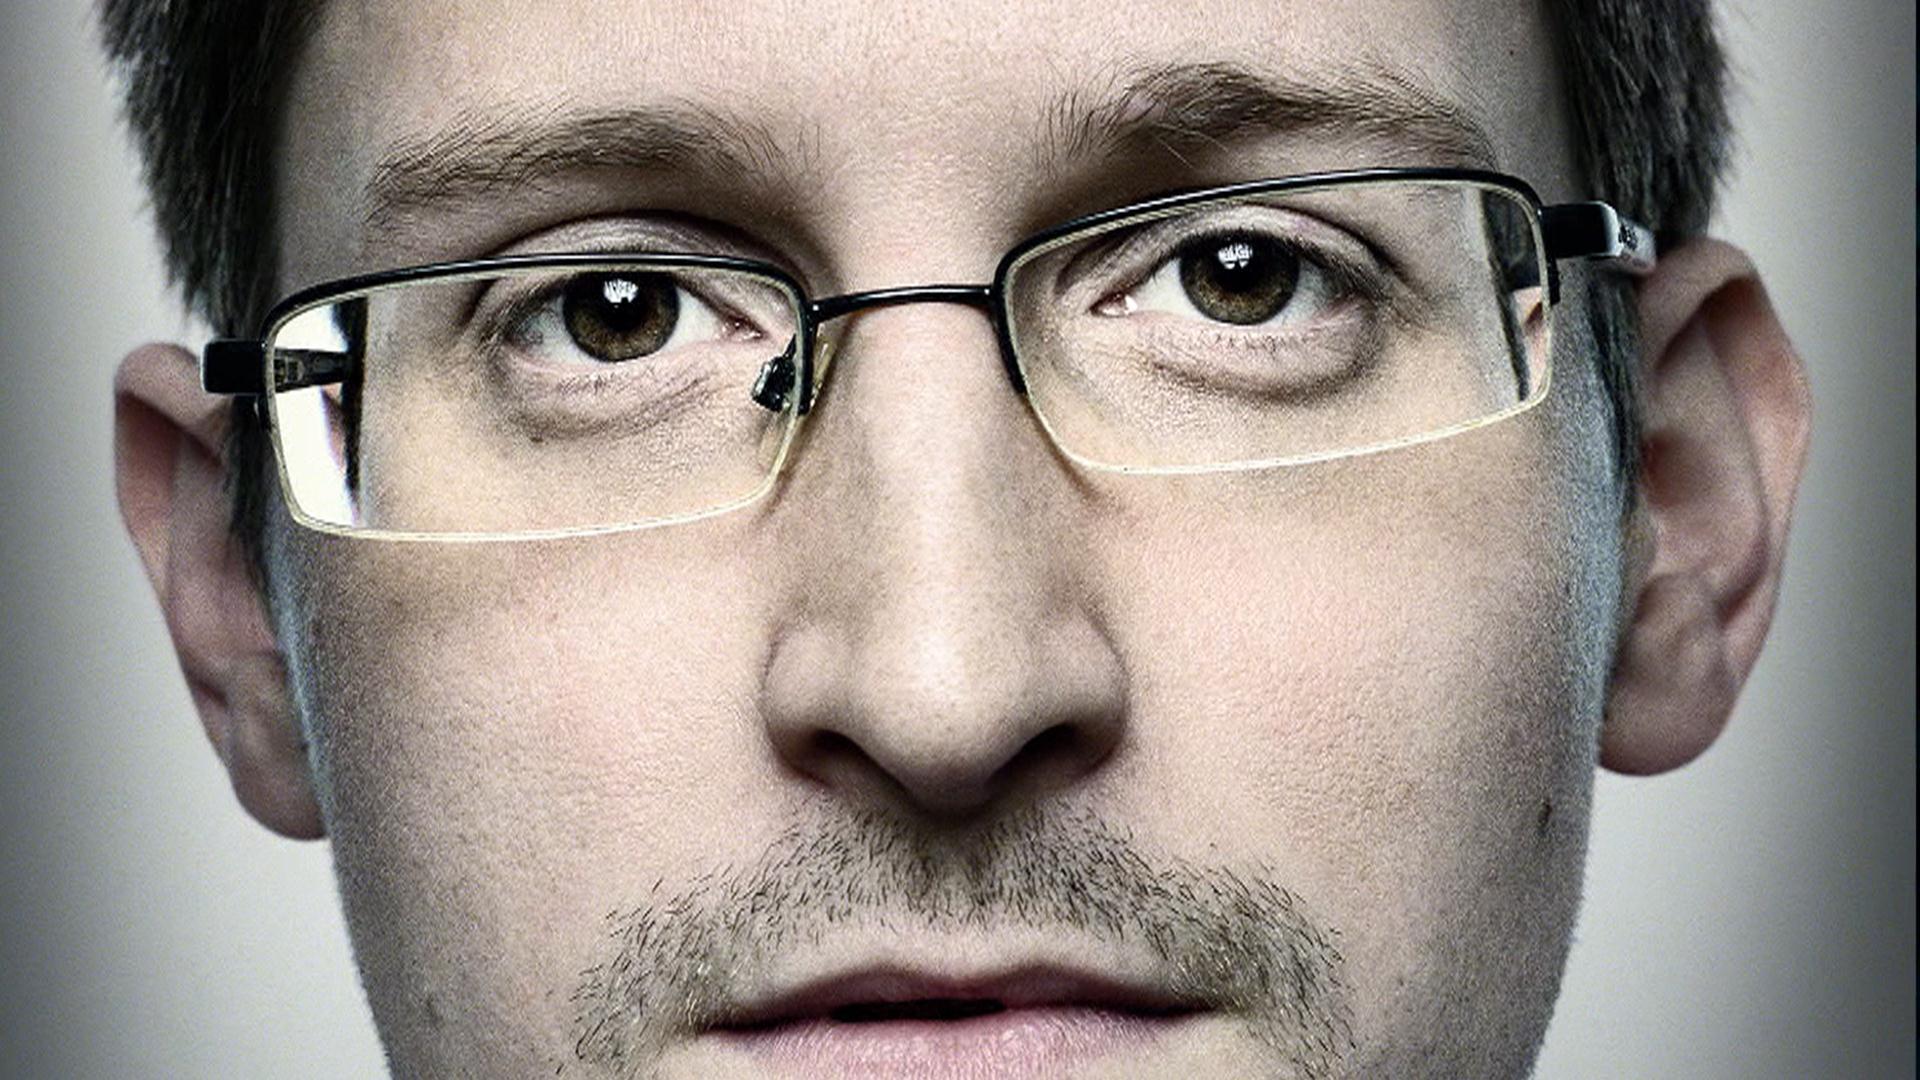 Nouvelle interview d'Edward Snowden #NSA #Surveillance